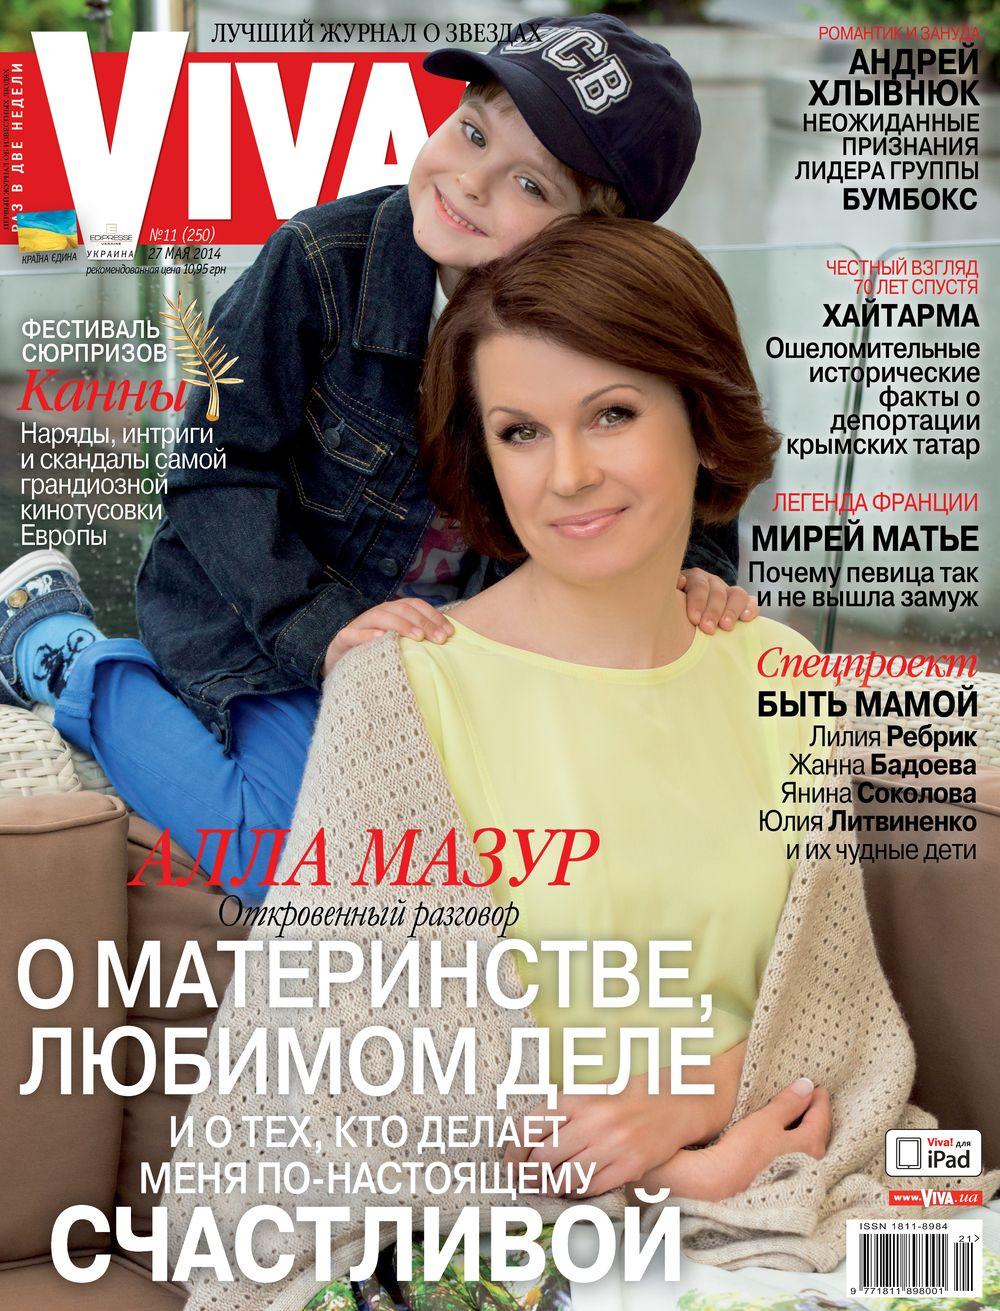 Алла Мазур журнал Viva